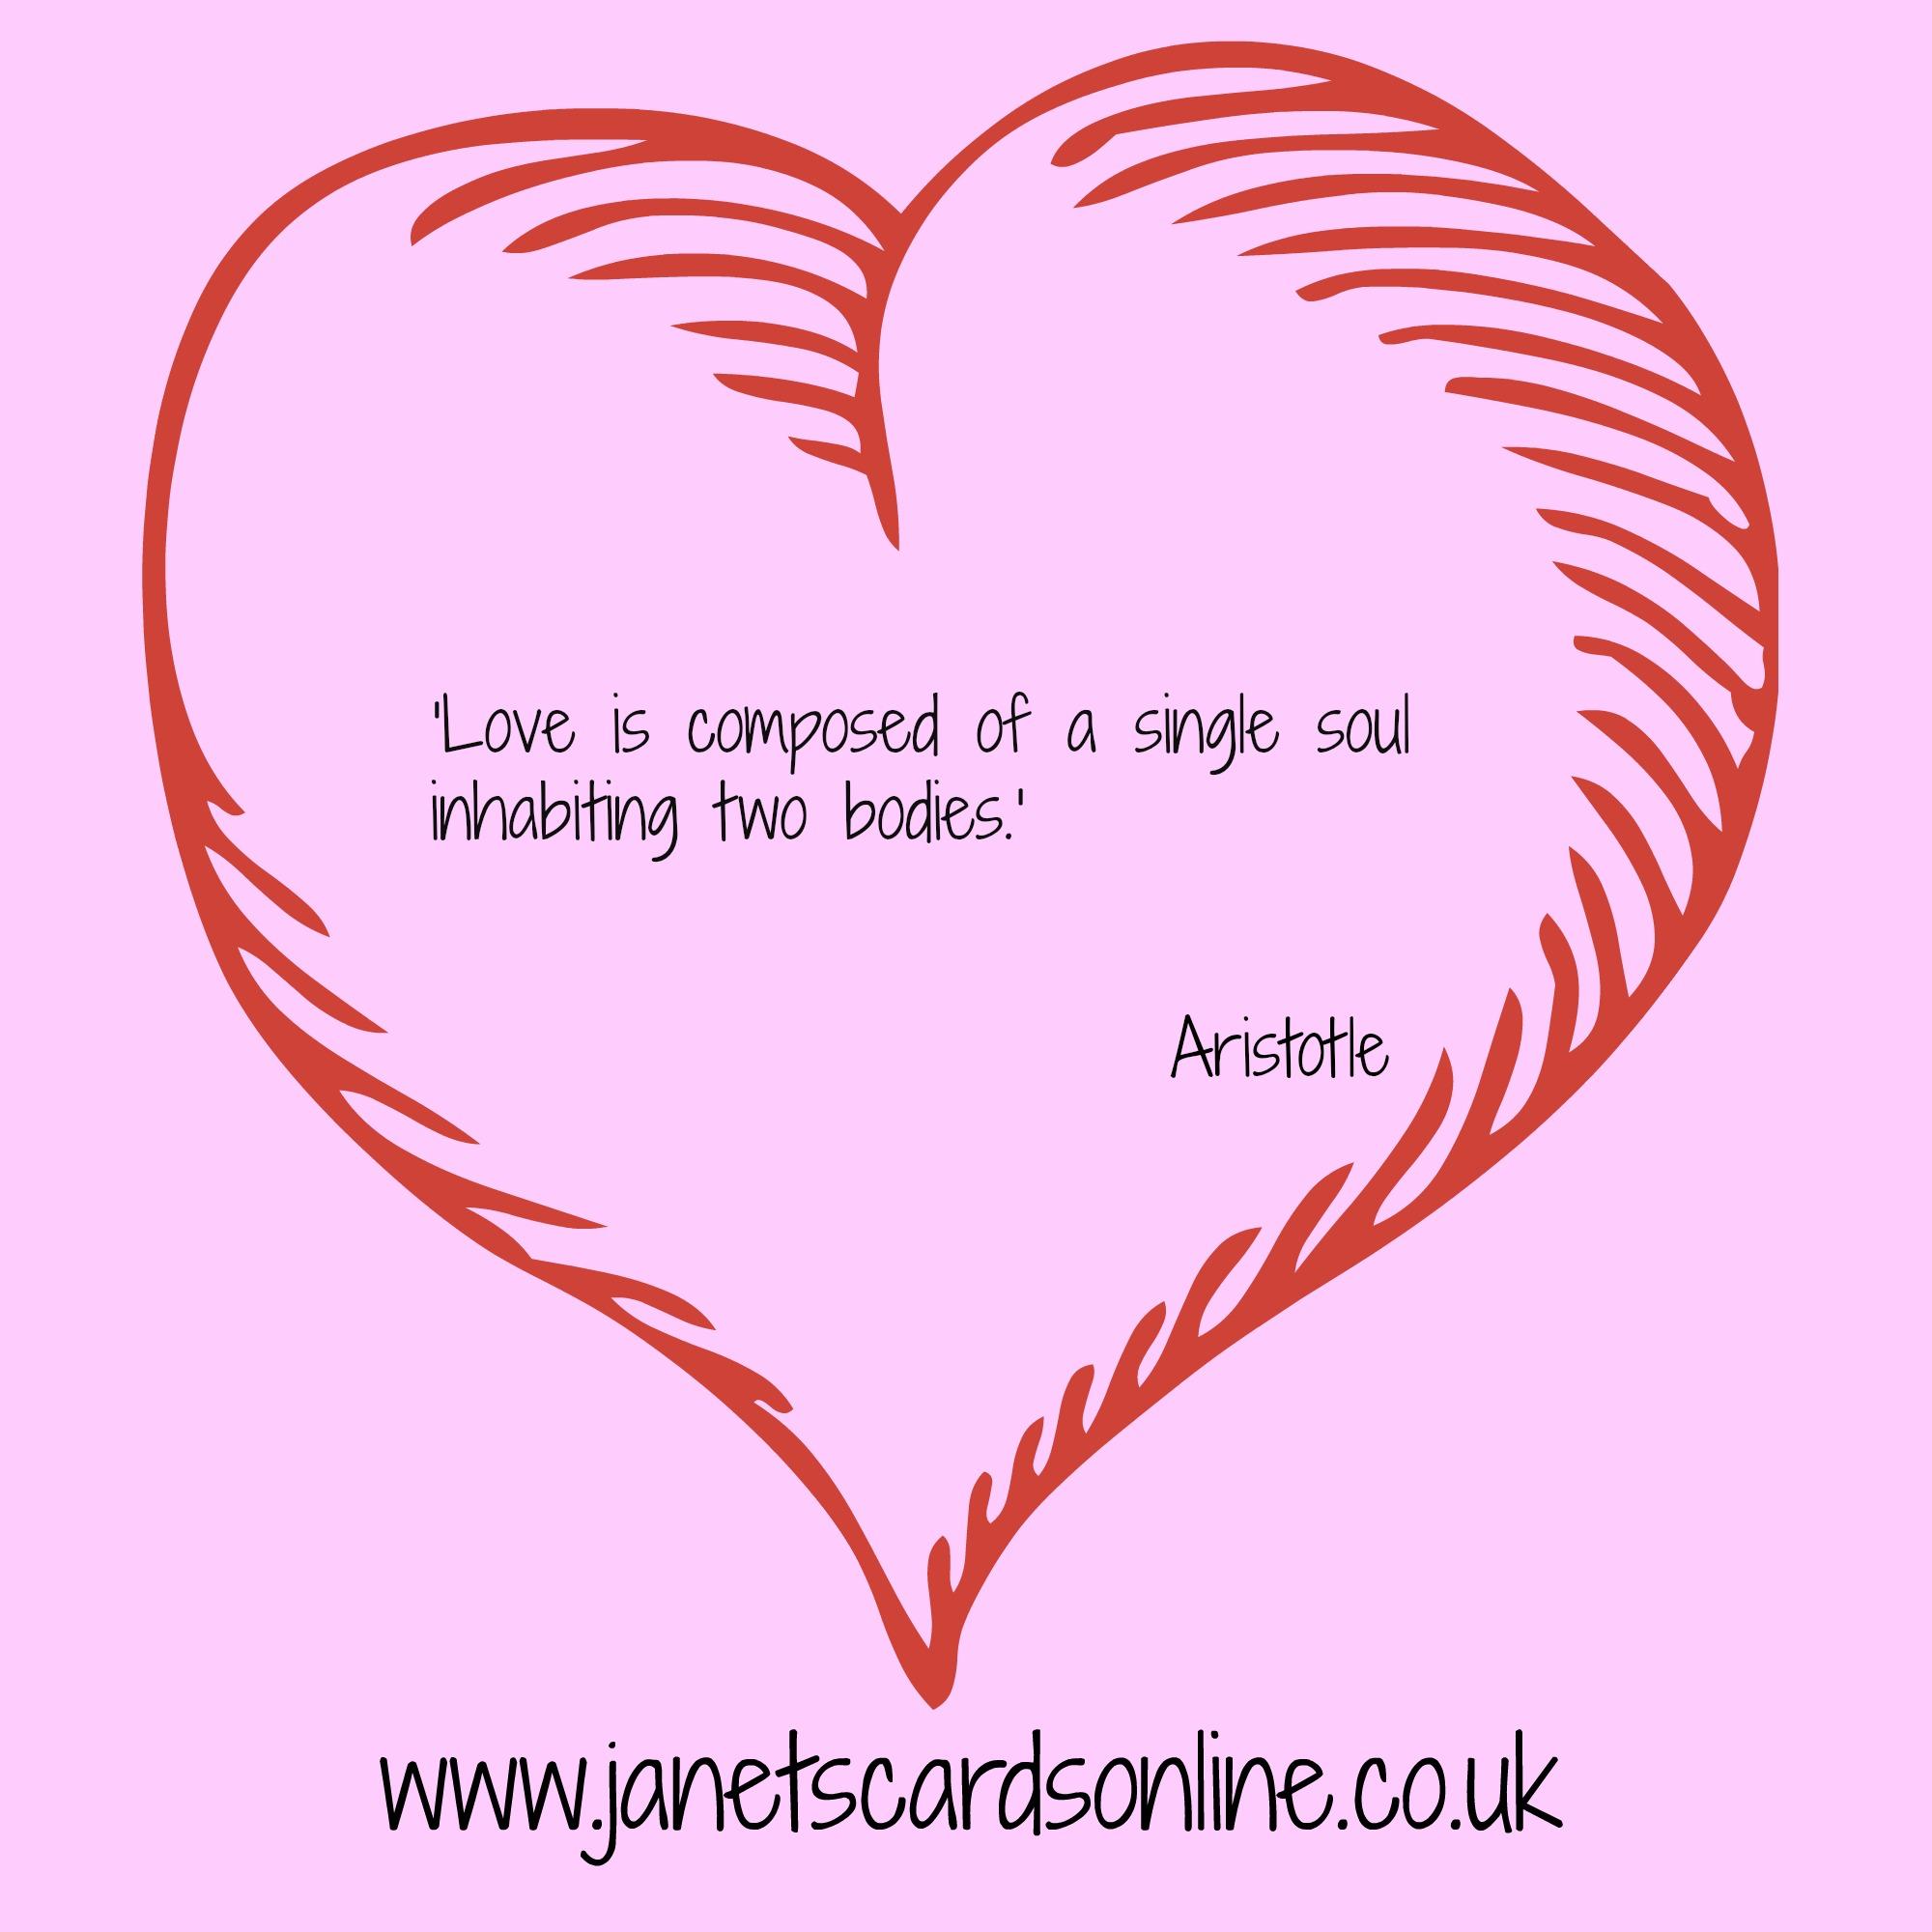 Aristotle love quote verse Valentines Day